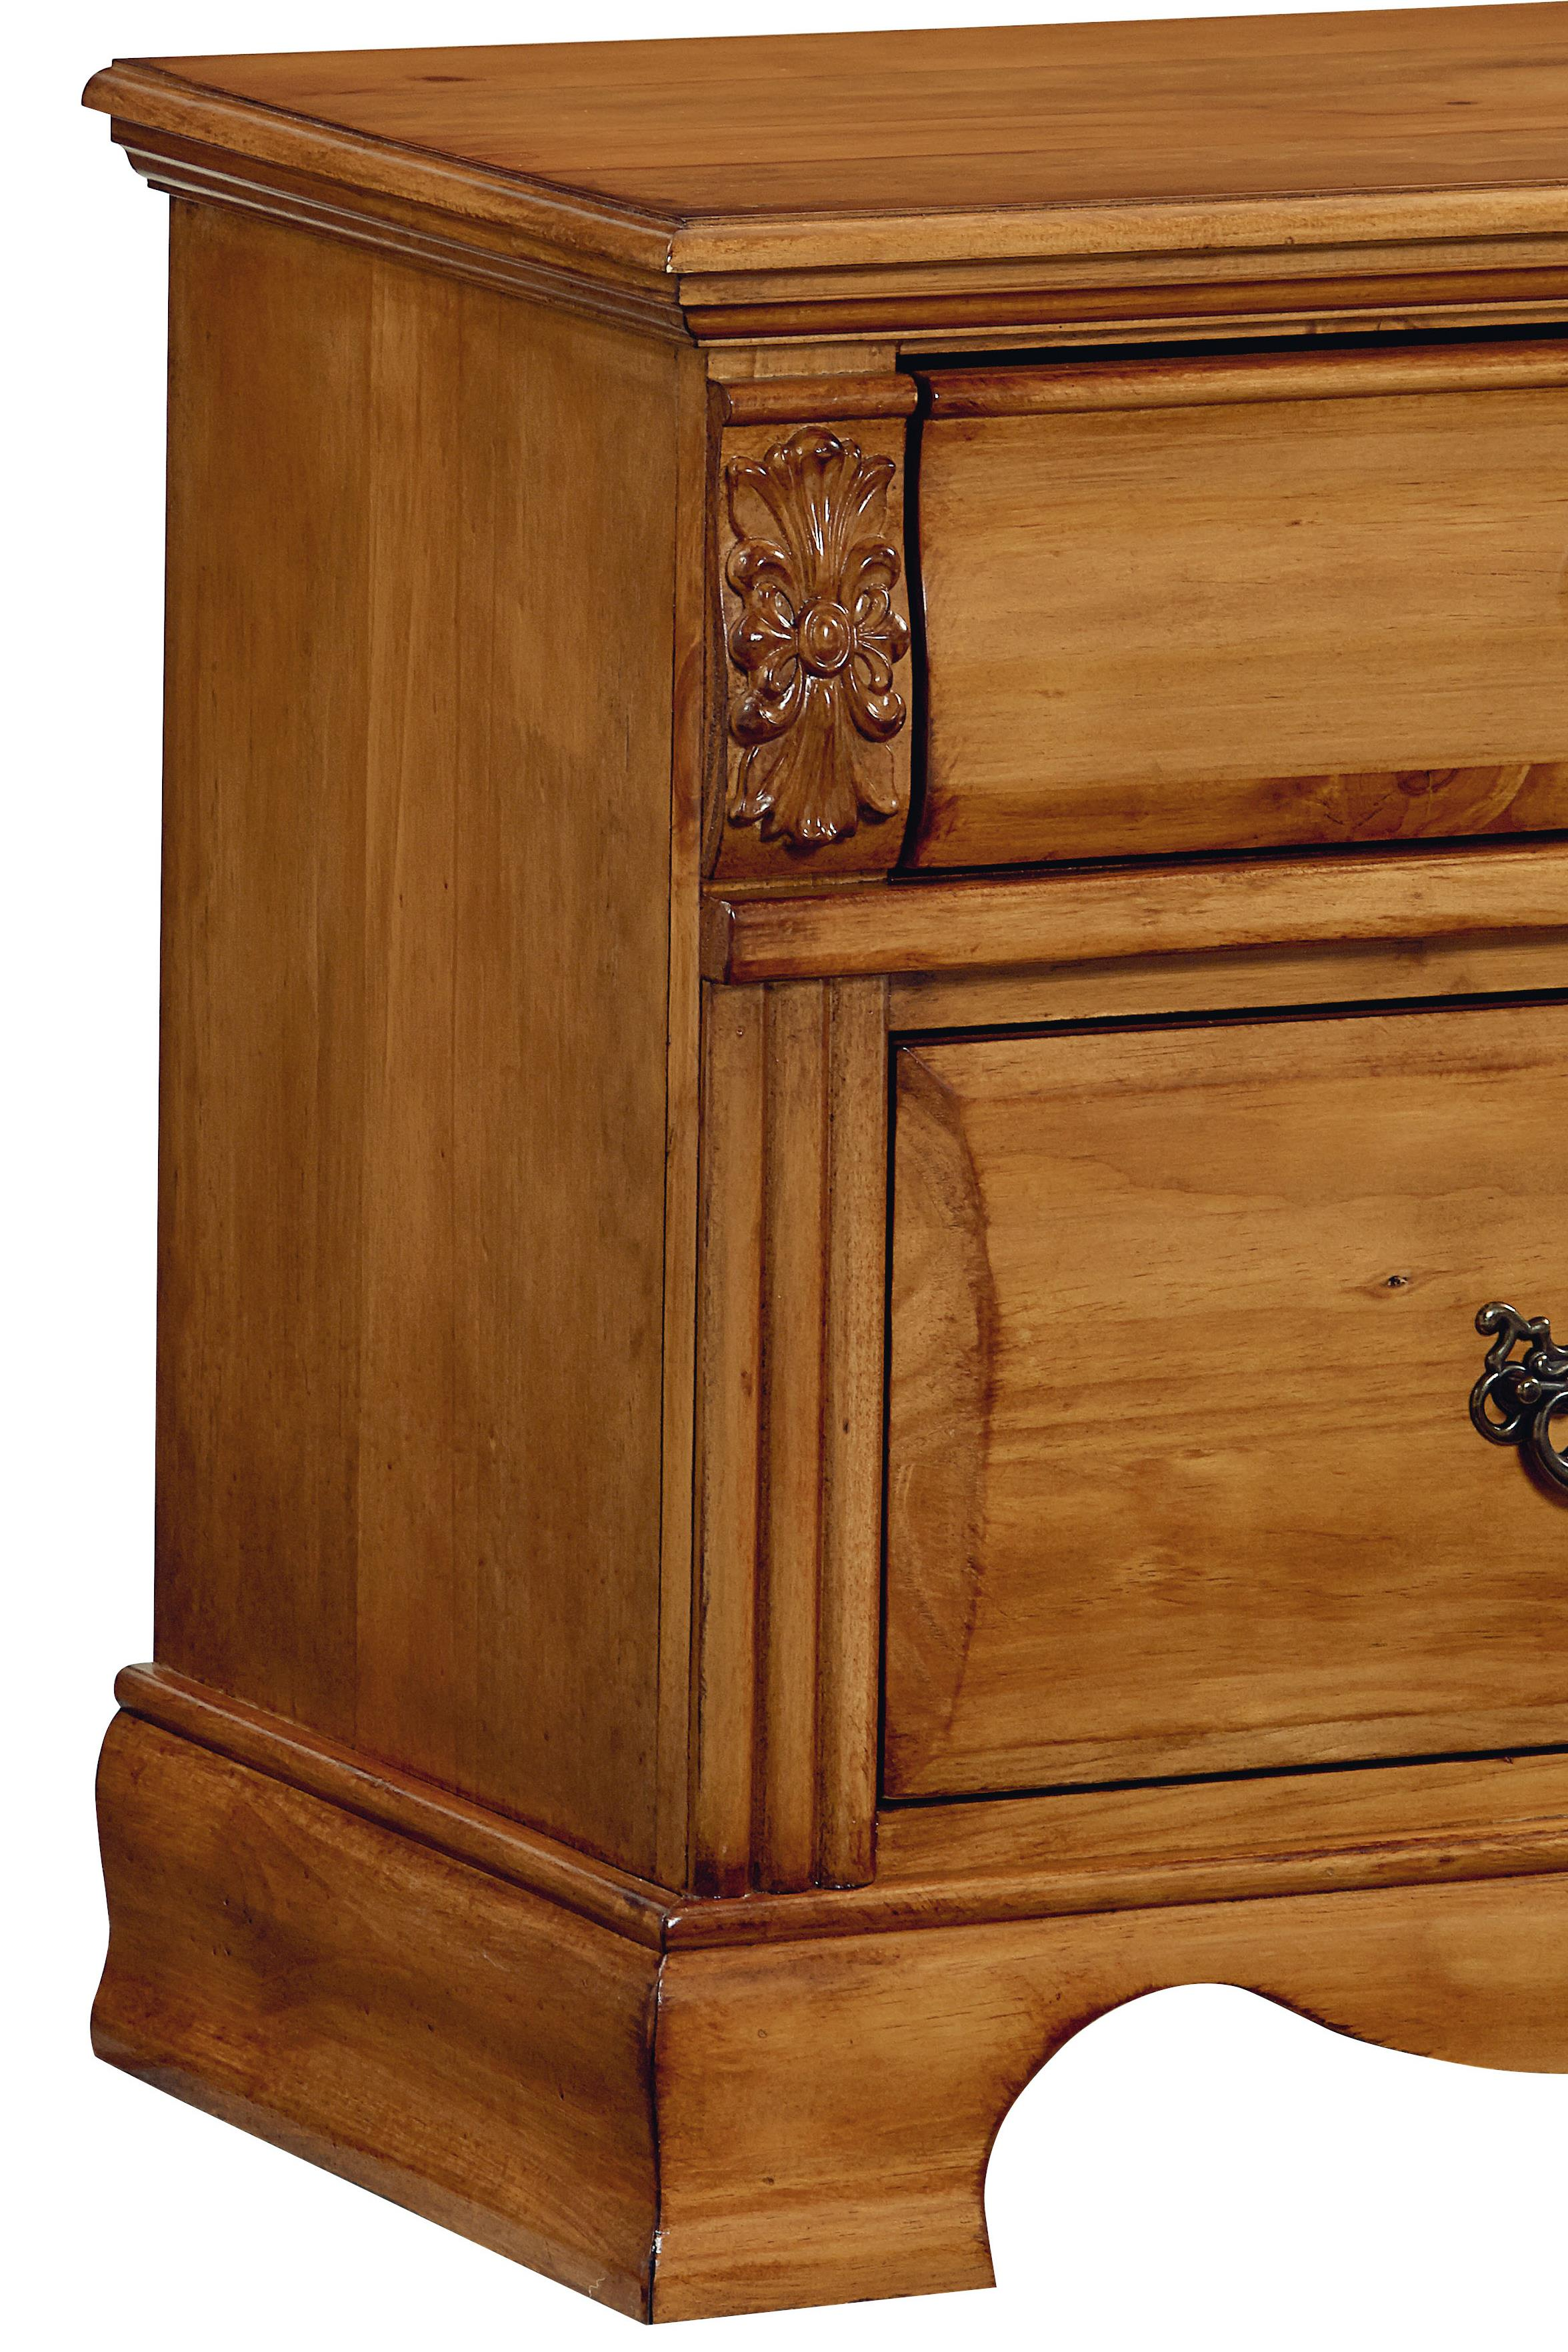 Georgetown 83000 by standard furniture j j furniture for J furniture dealers